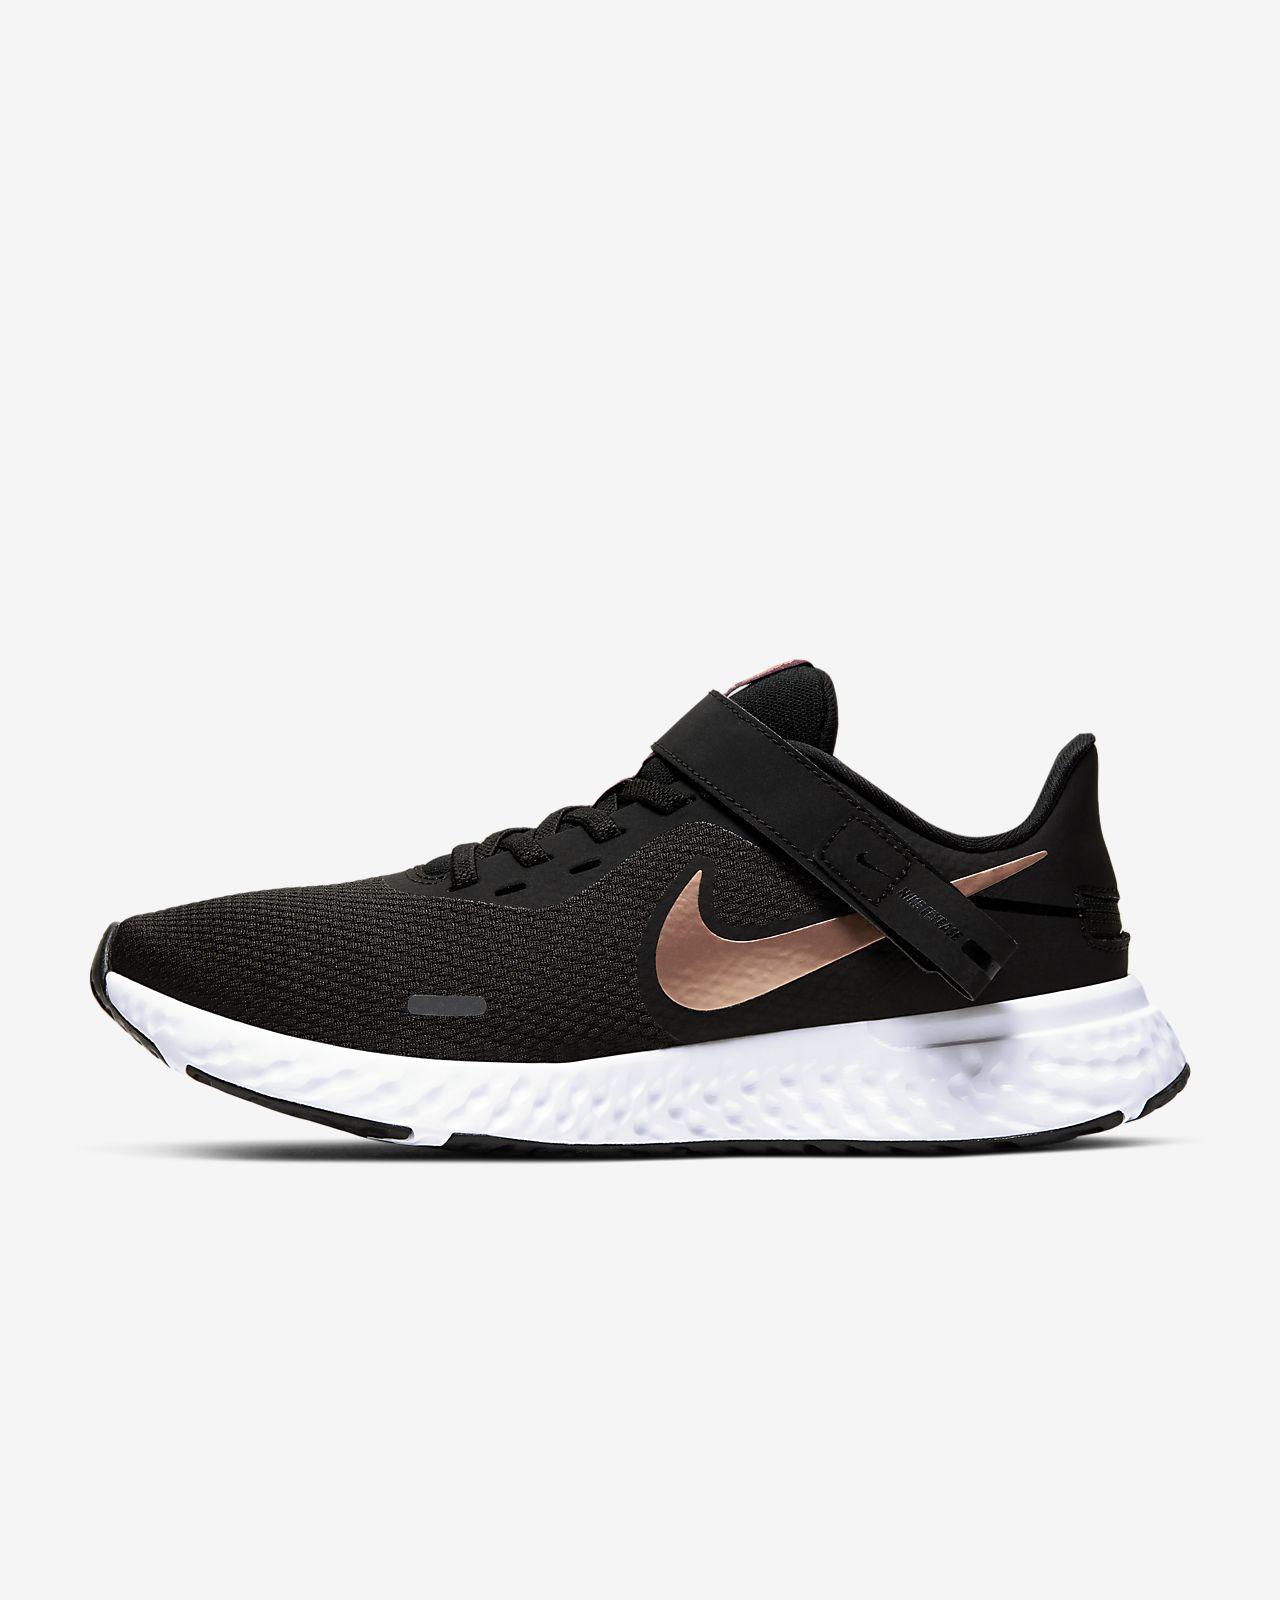 Calzado de running para mujer Nike Revolution 5 FlyEase